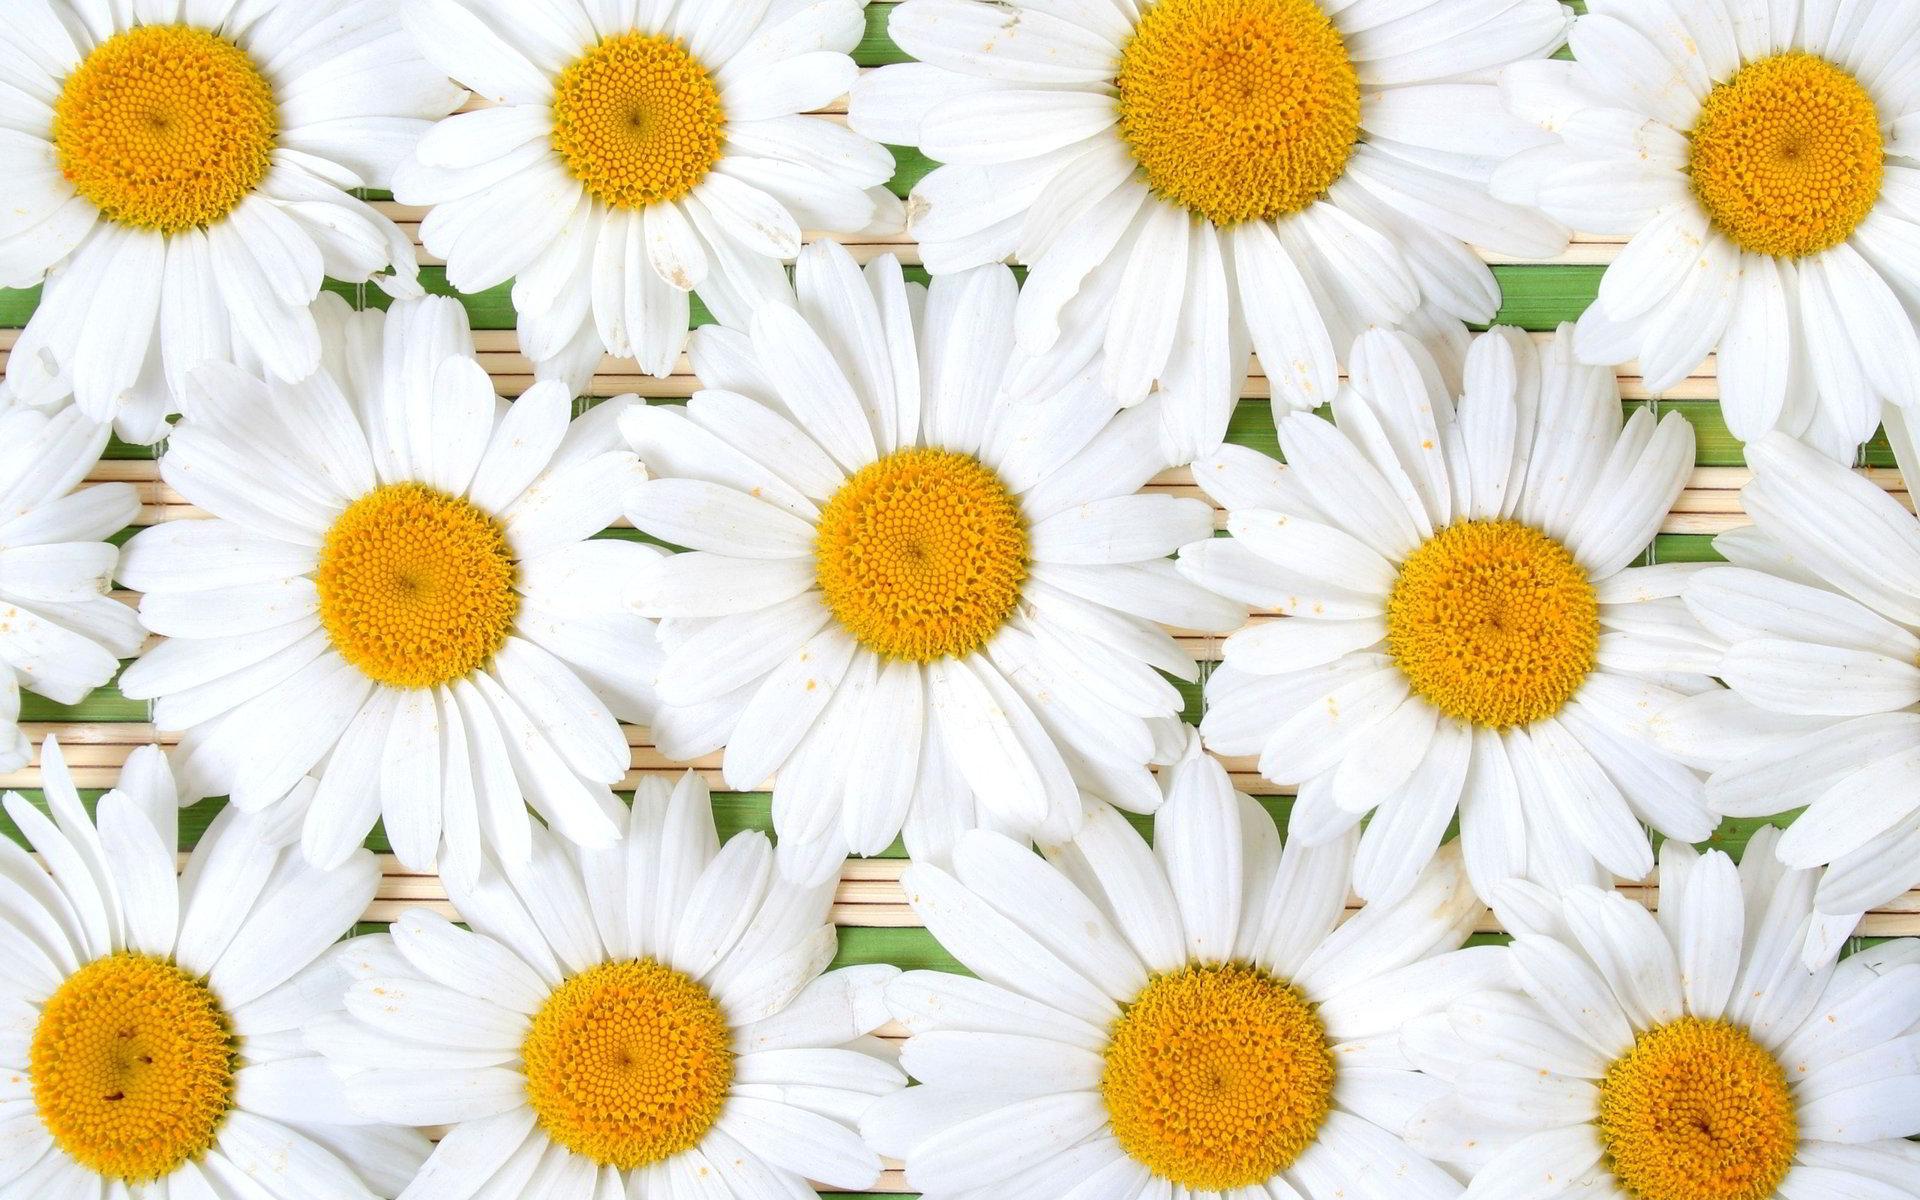 hinh anh hoa cuc dep 28